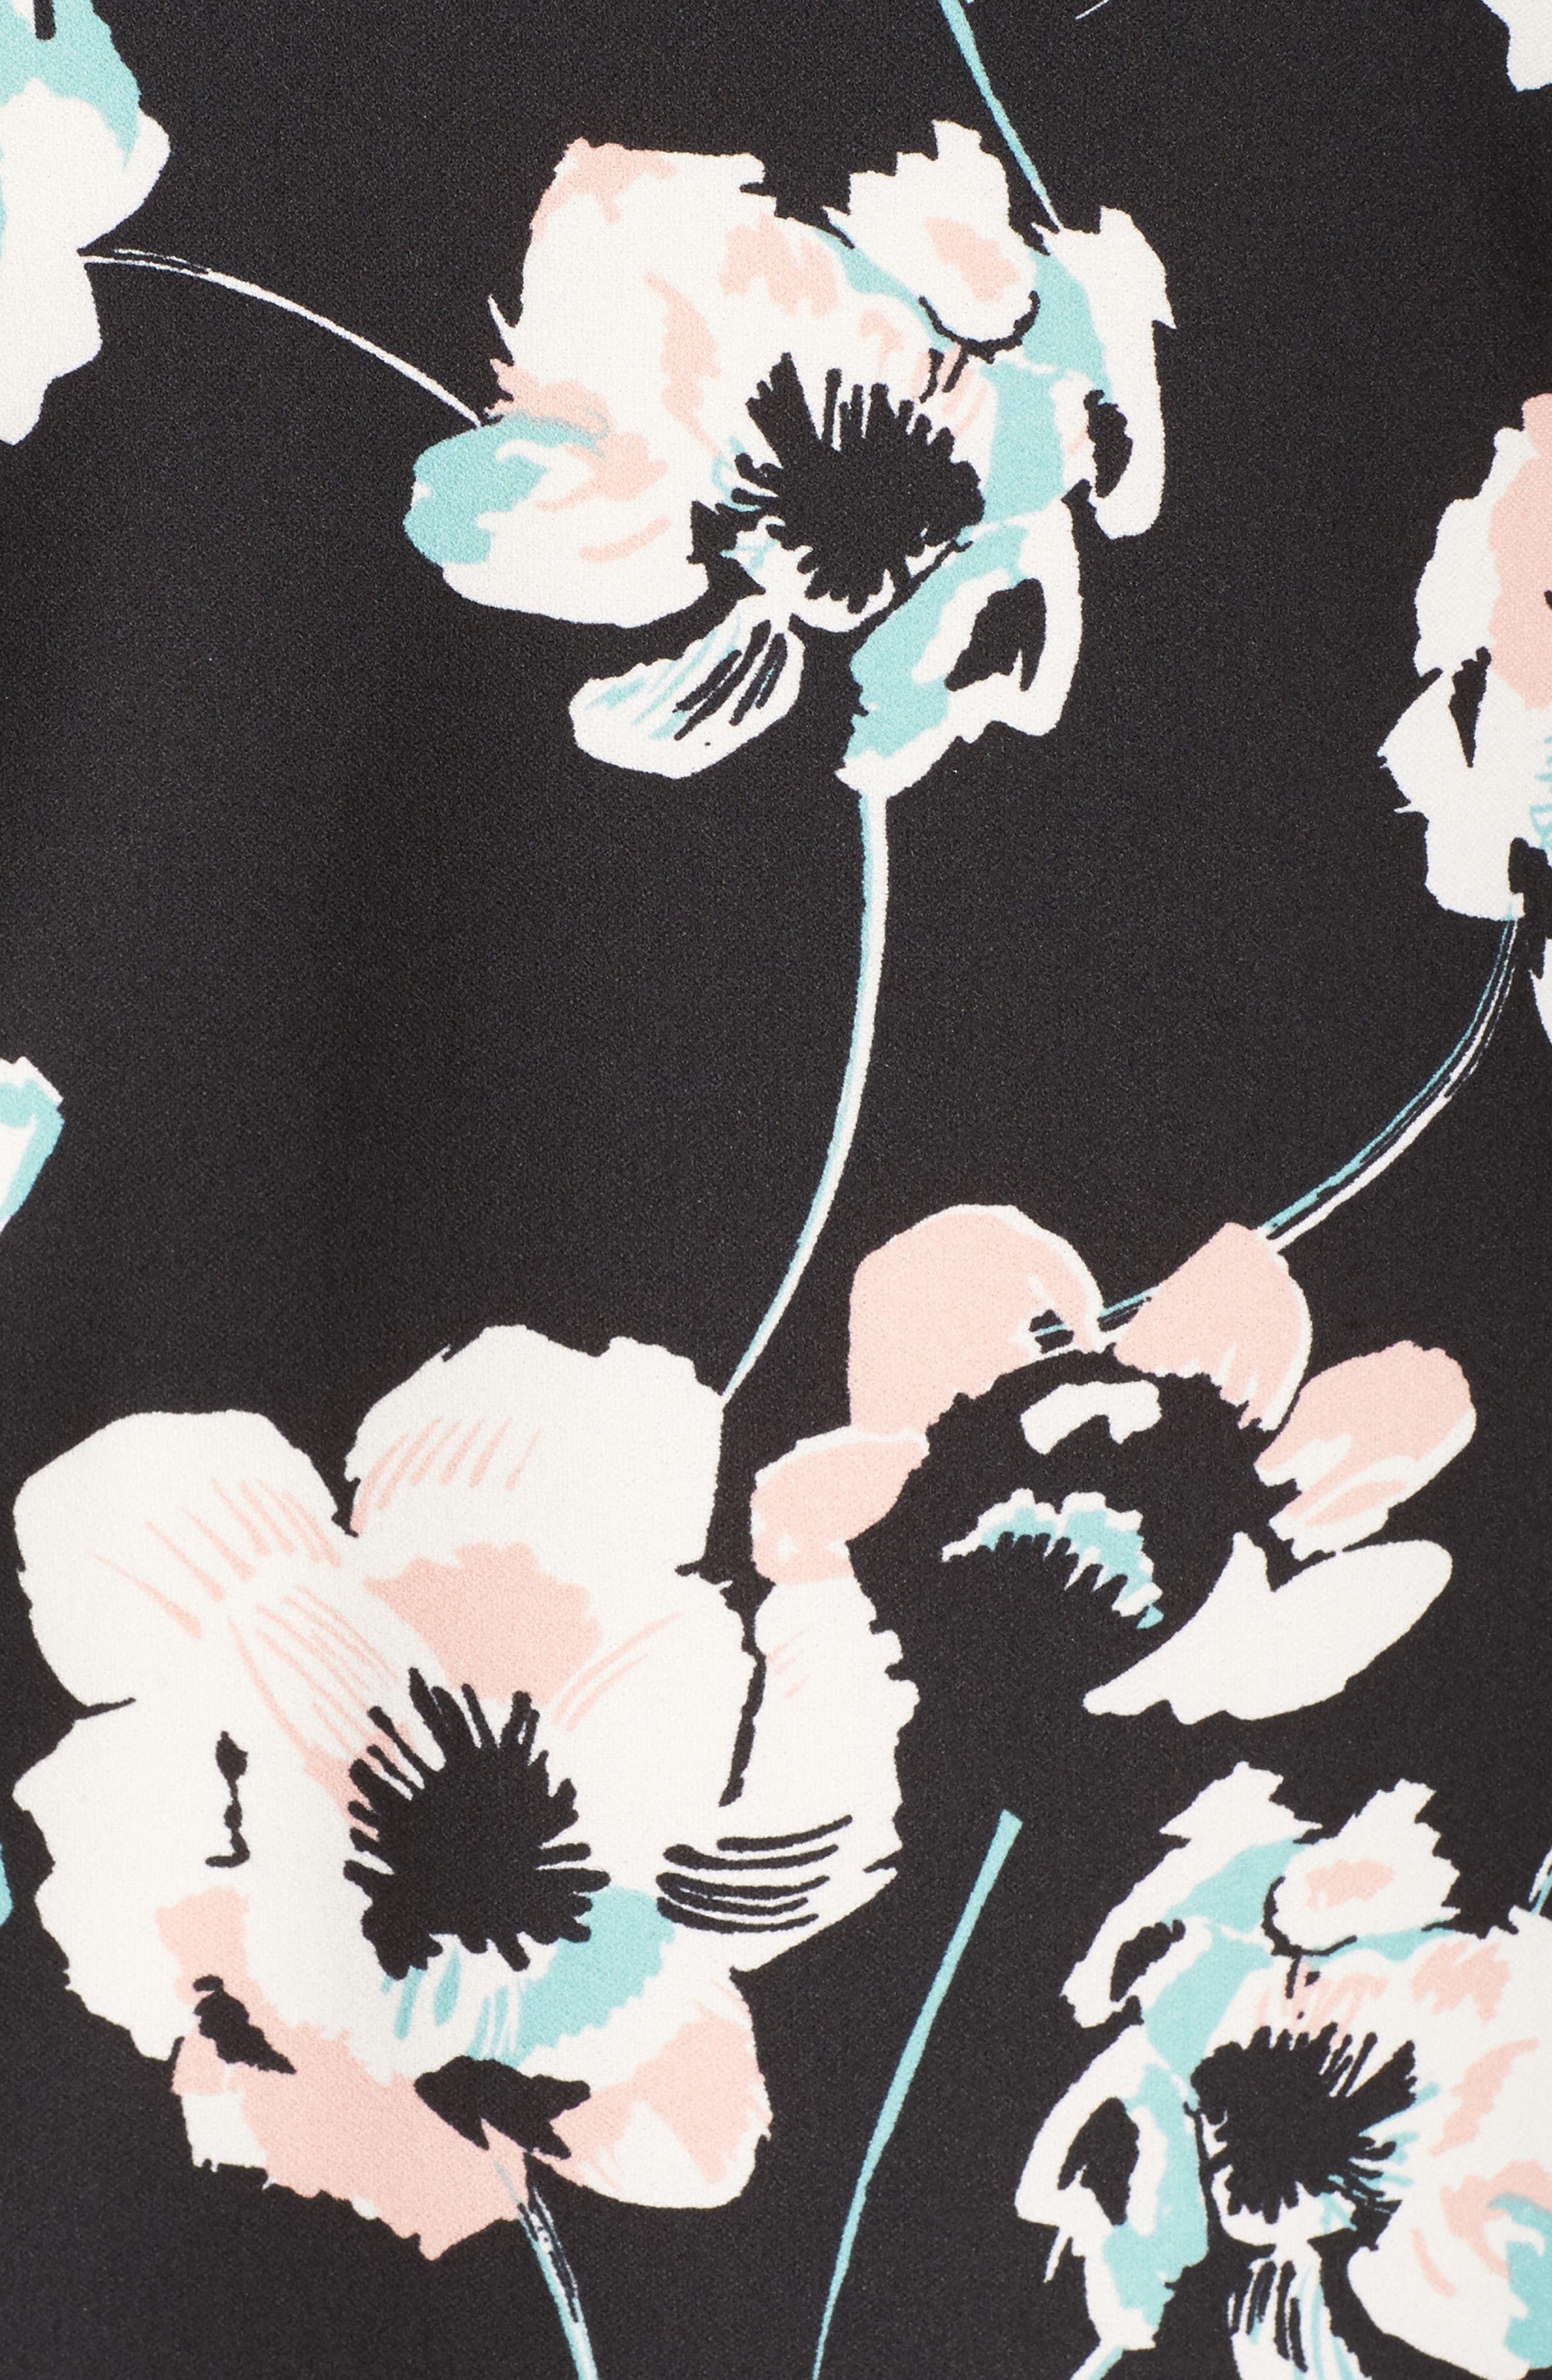 Slit Sleeve Floral Shift Dress,                             Alternate thumbnail 5, color,                             Black